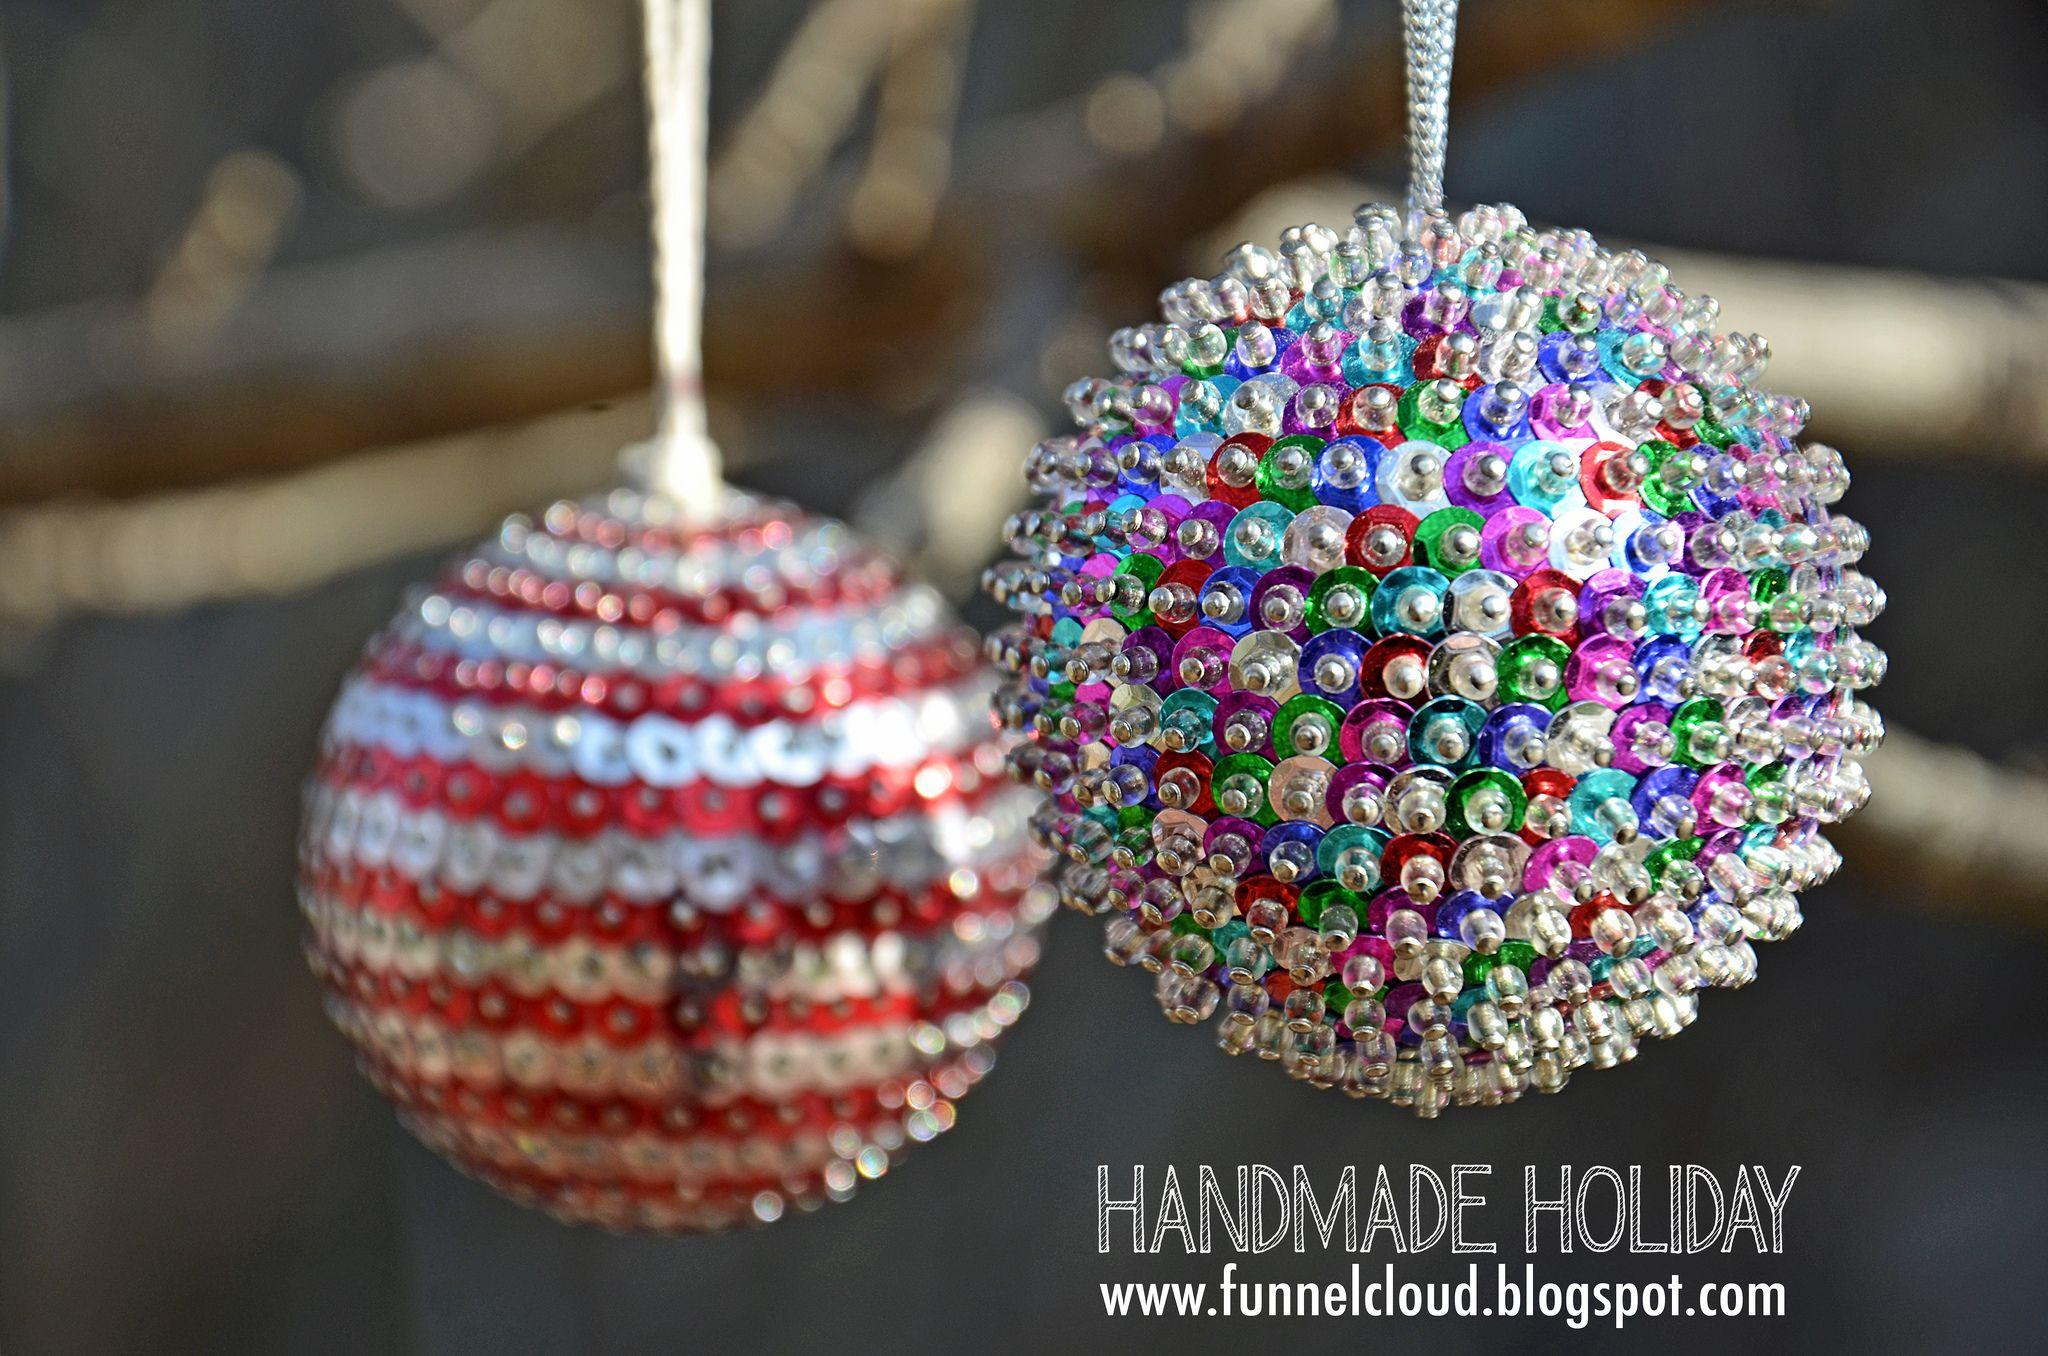 Handmade Holiday Sequin Balls Handmade Christmas Ornaments Handmade Christmas Handmade Holiday